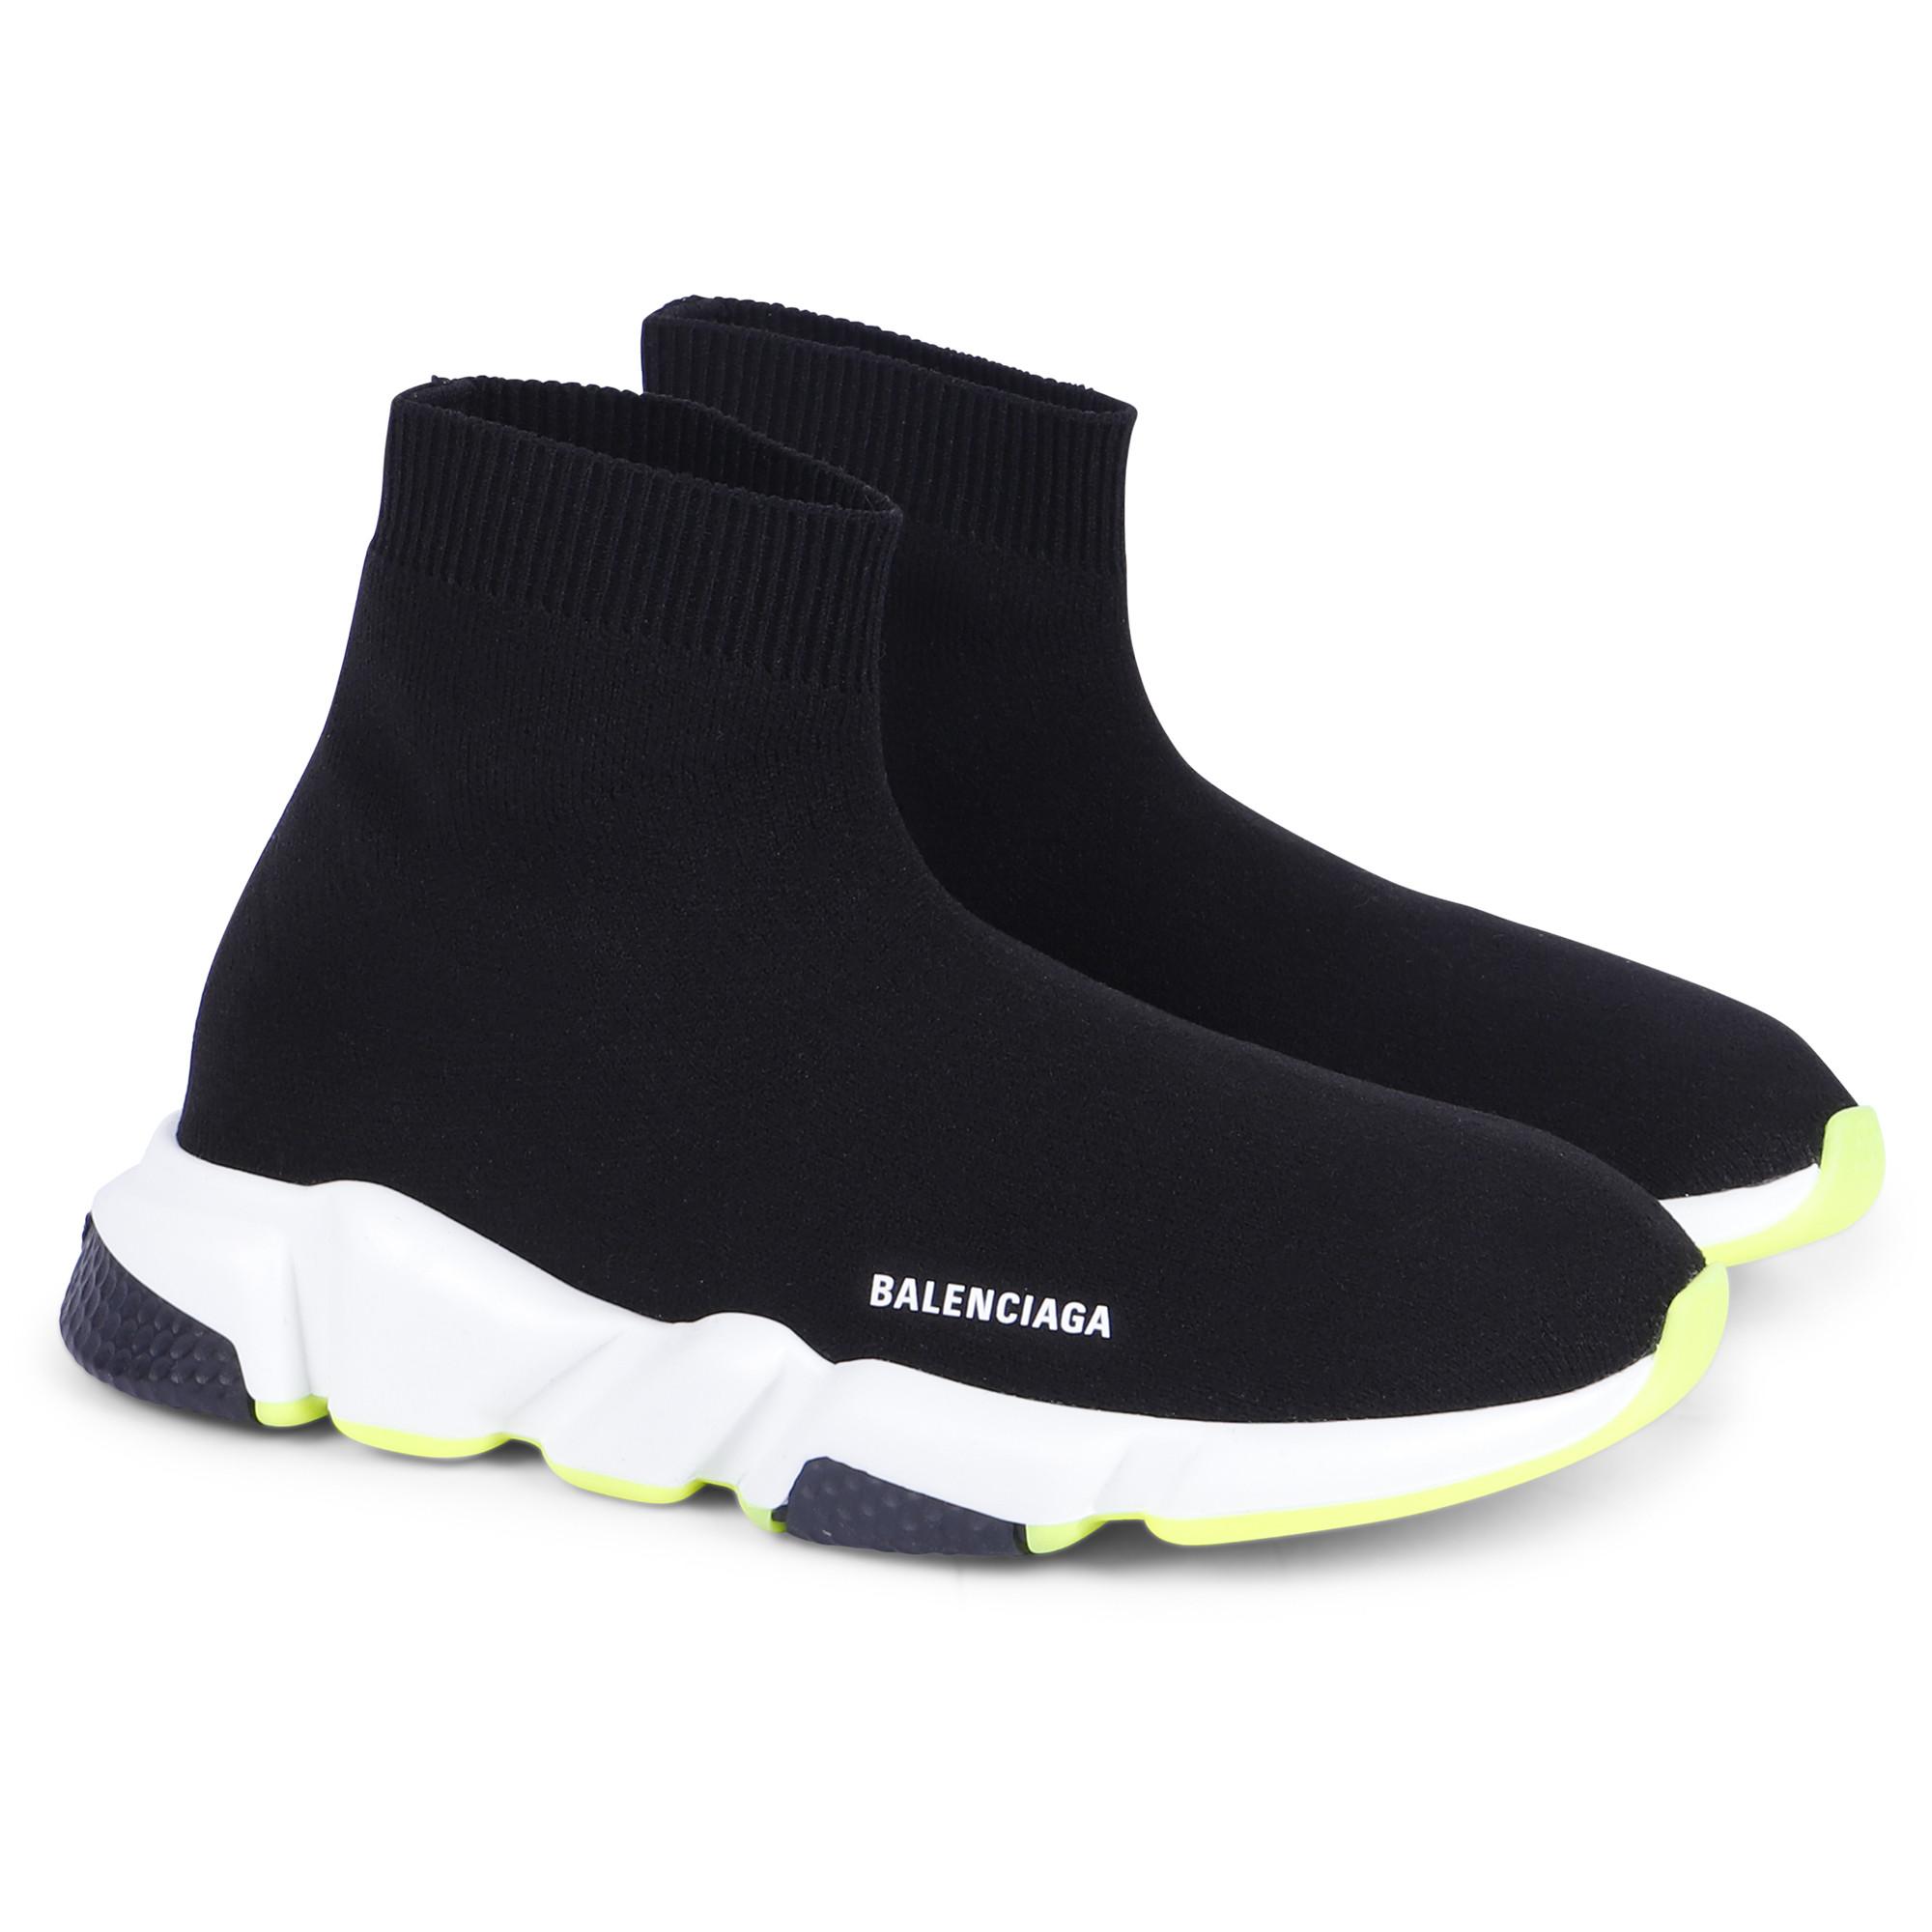 Balenciaga Black Knit Sock Sneakers